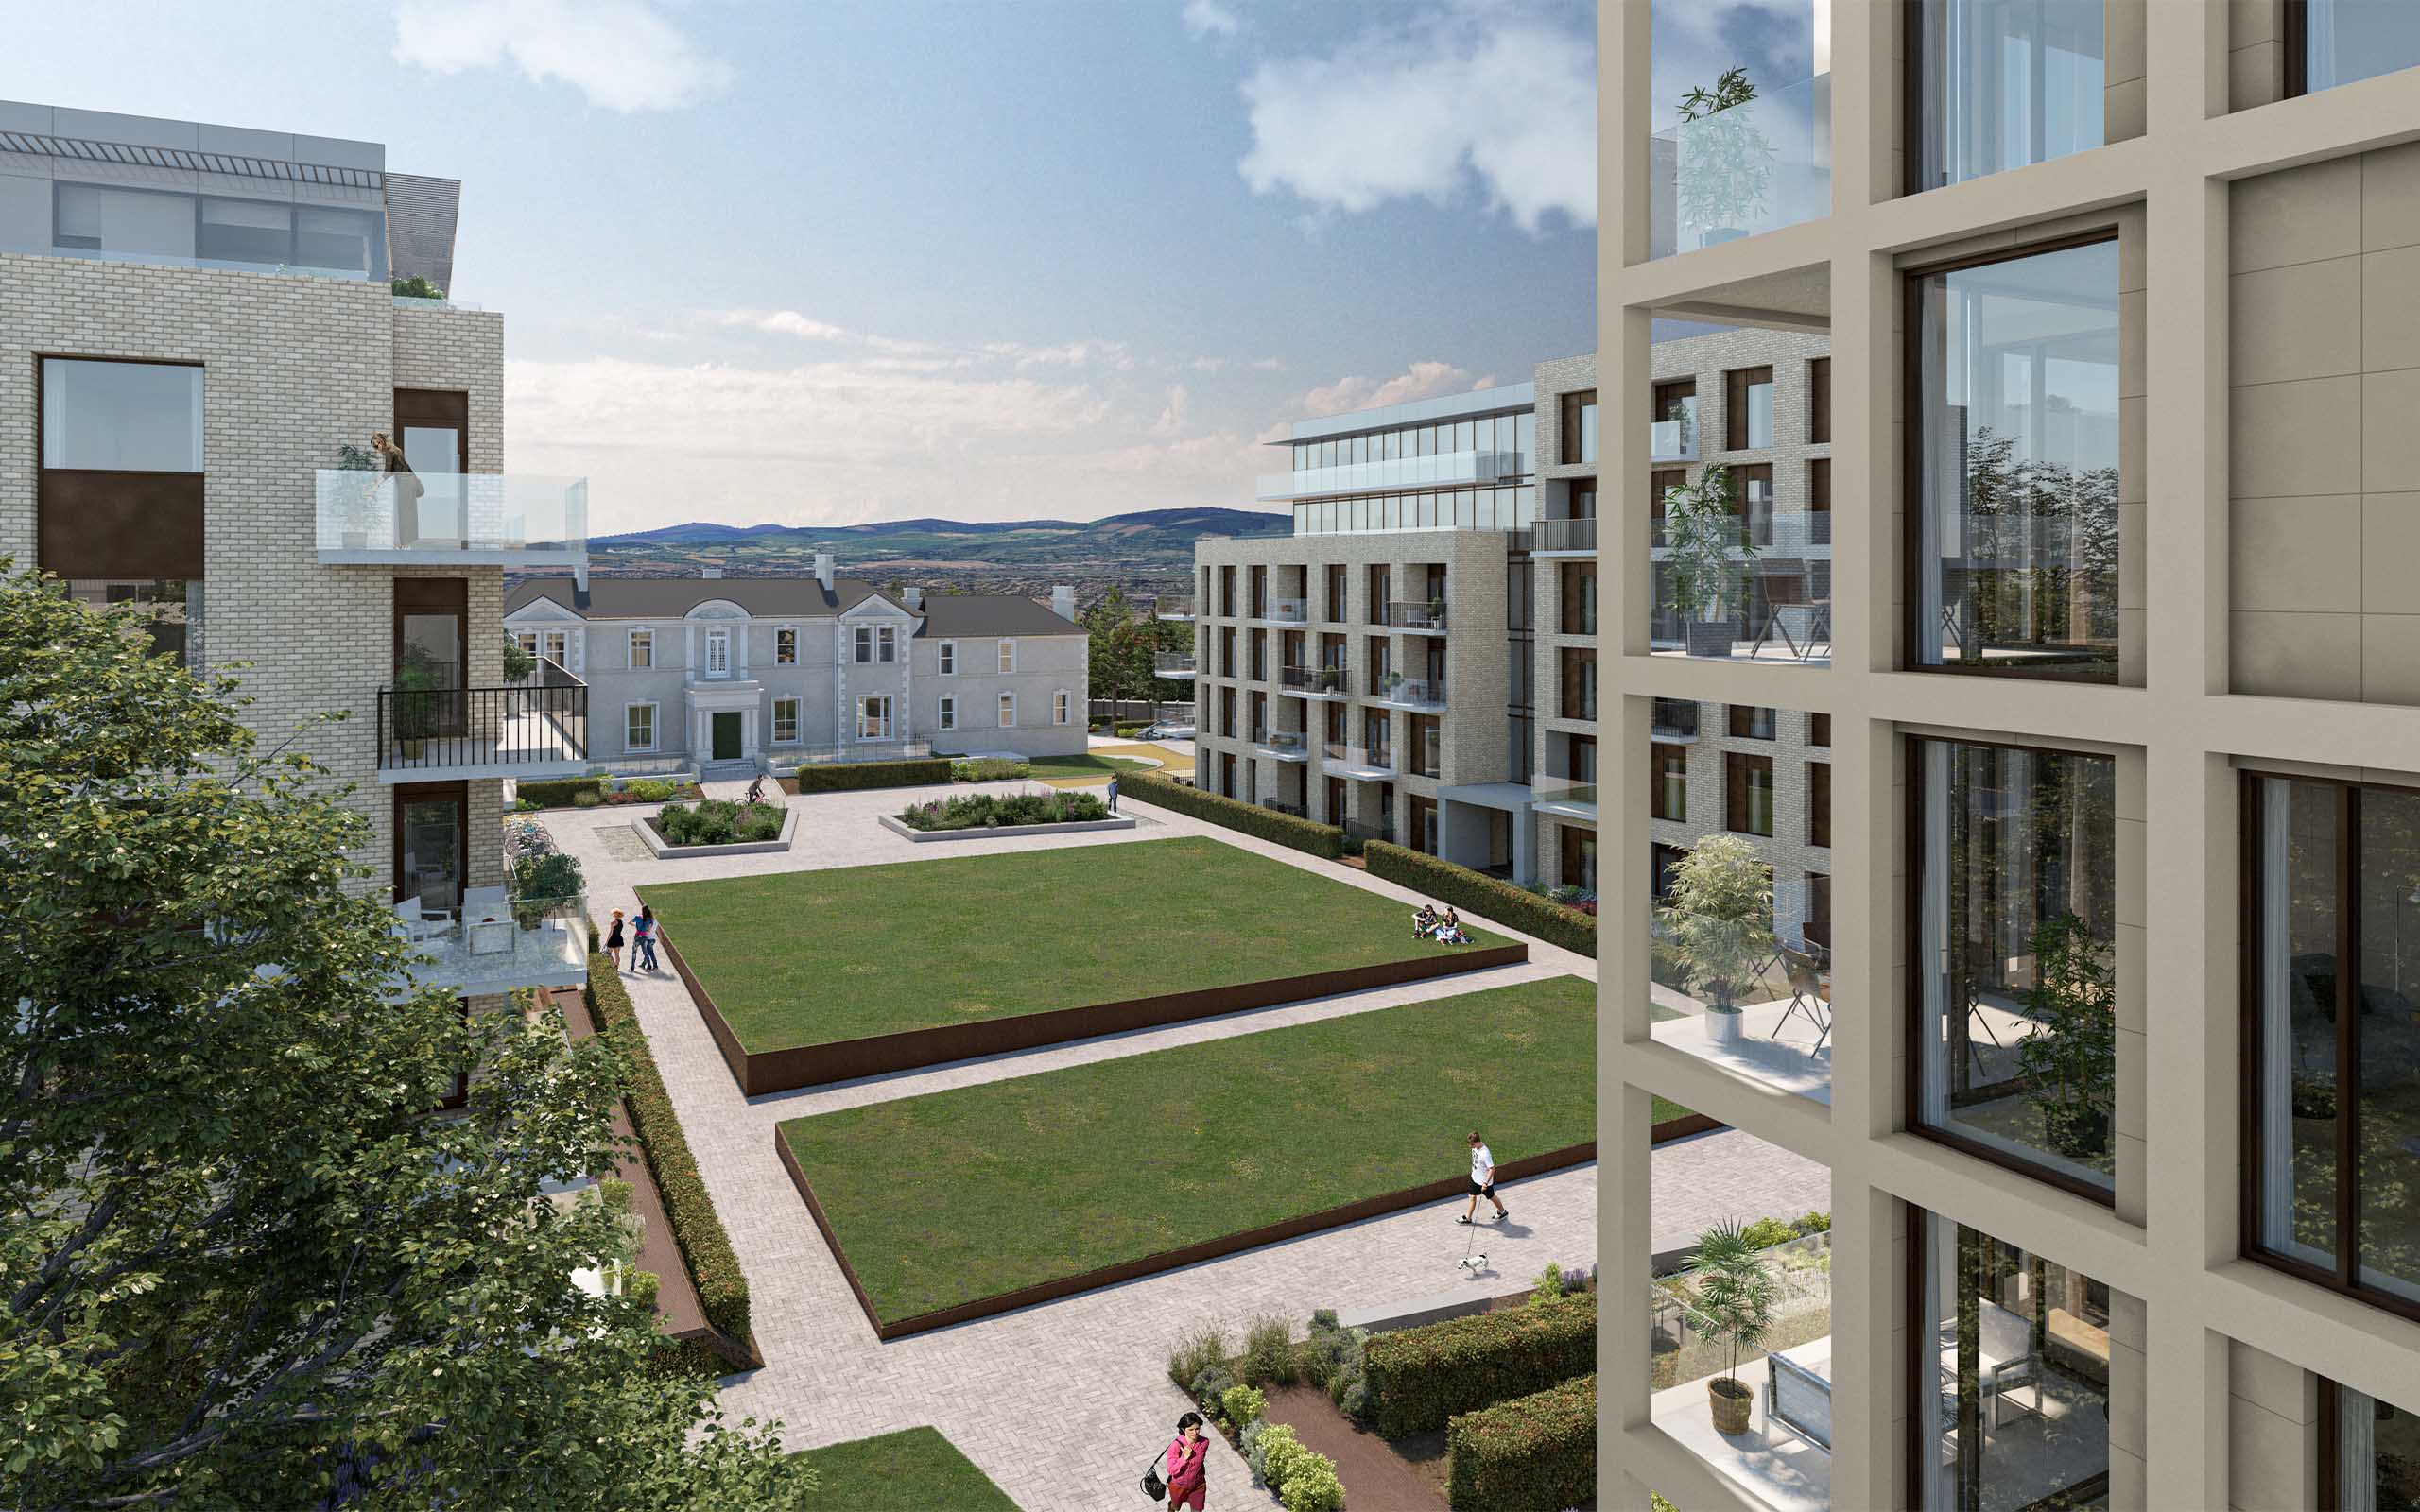 Architectural CGI of Dalguise SHD, Monkstown, South Dublin.